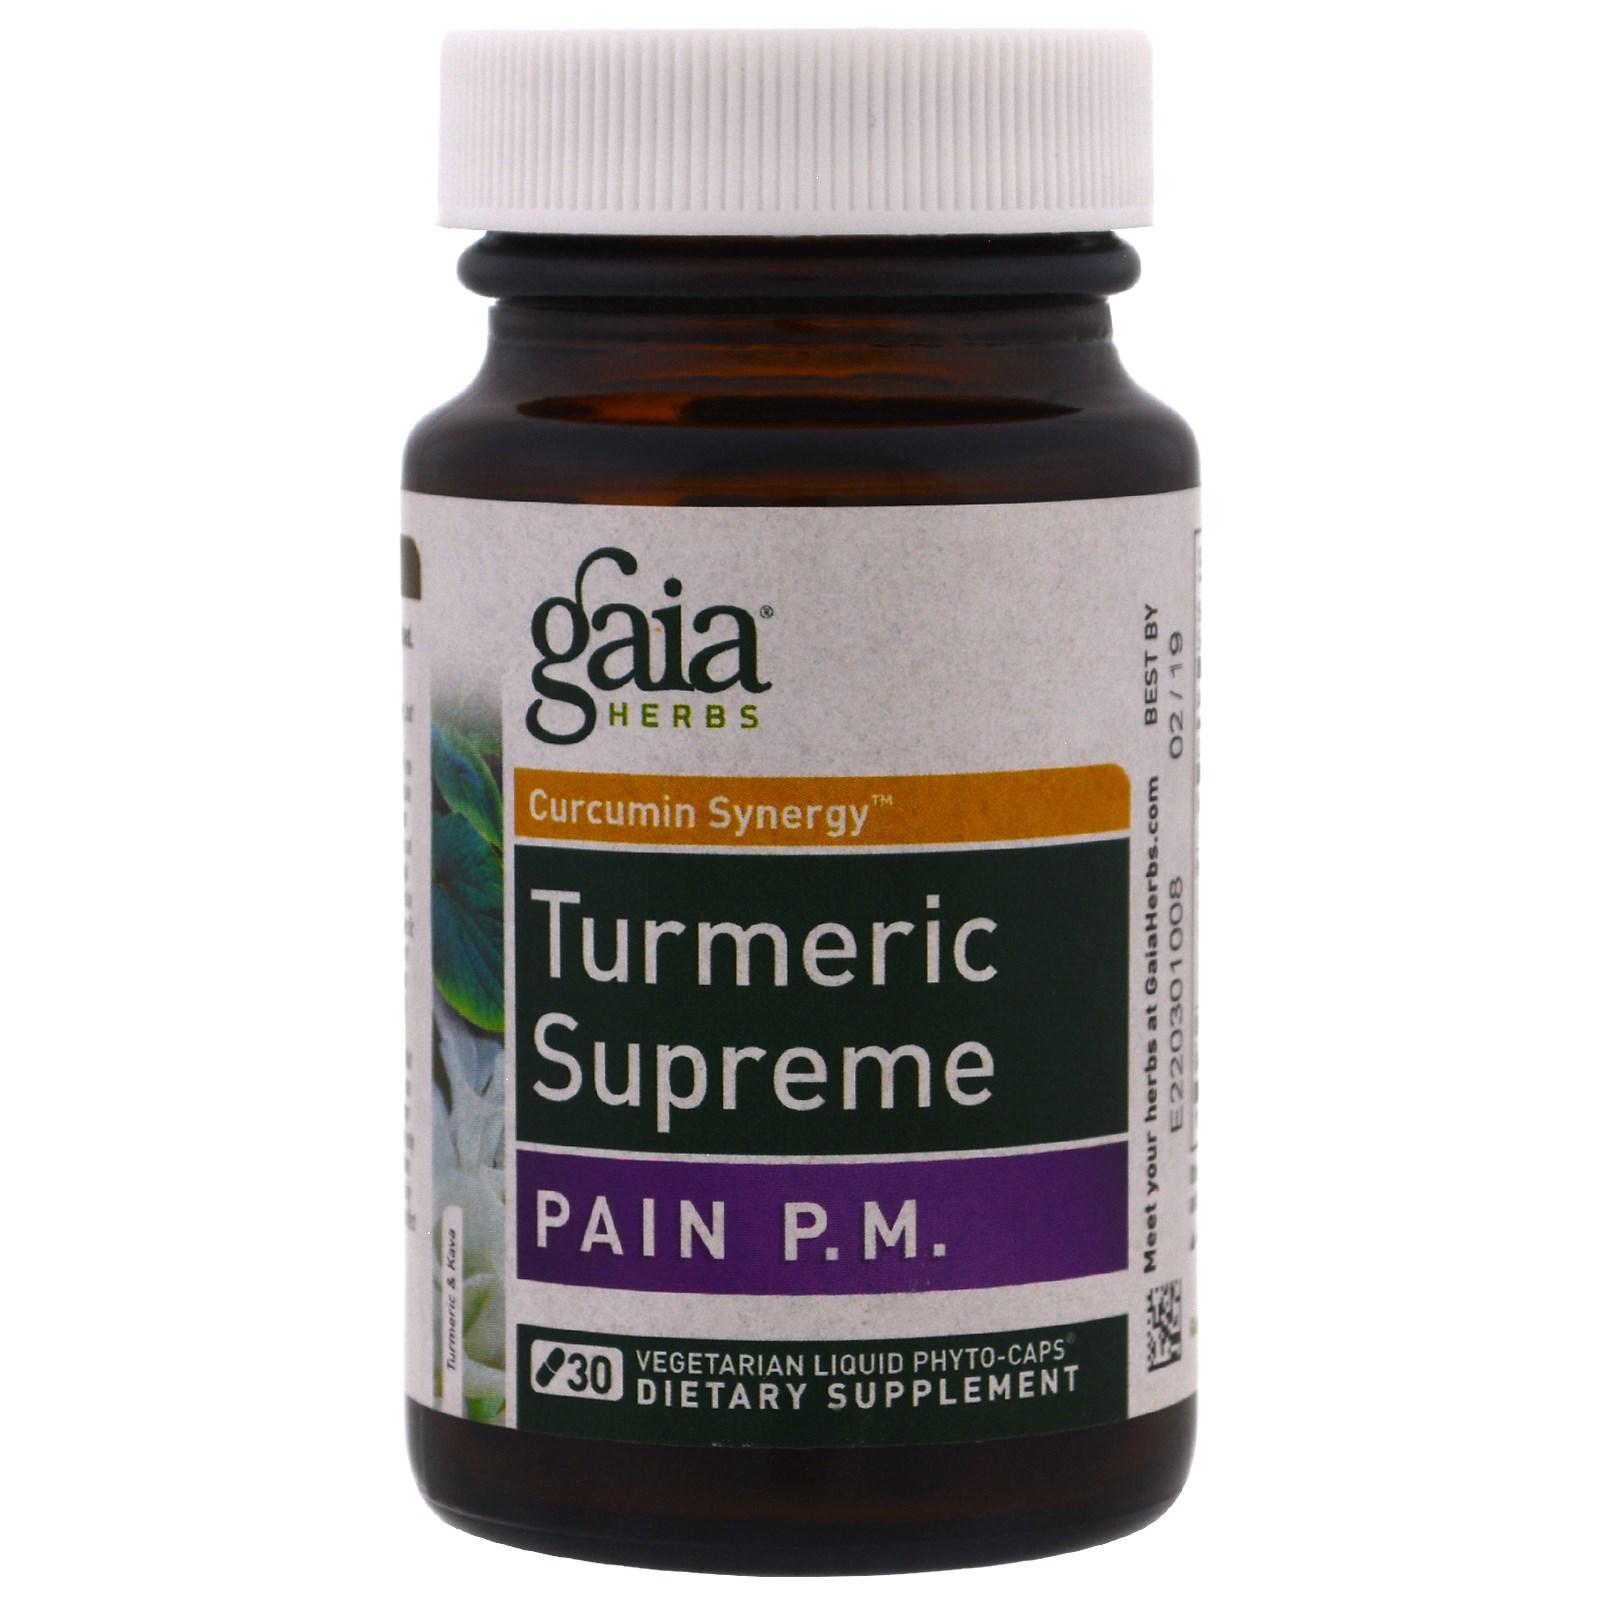 Gaia Herbs, Turmeric Supreme, Средство от боли в ночное время, 30 вегетарианских жидких фито-капсул